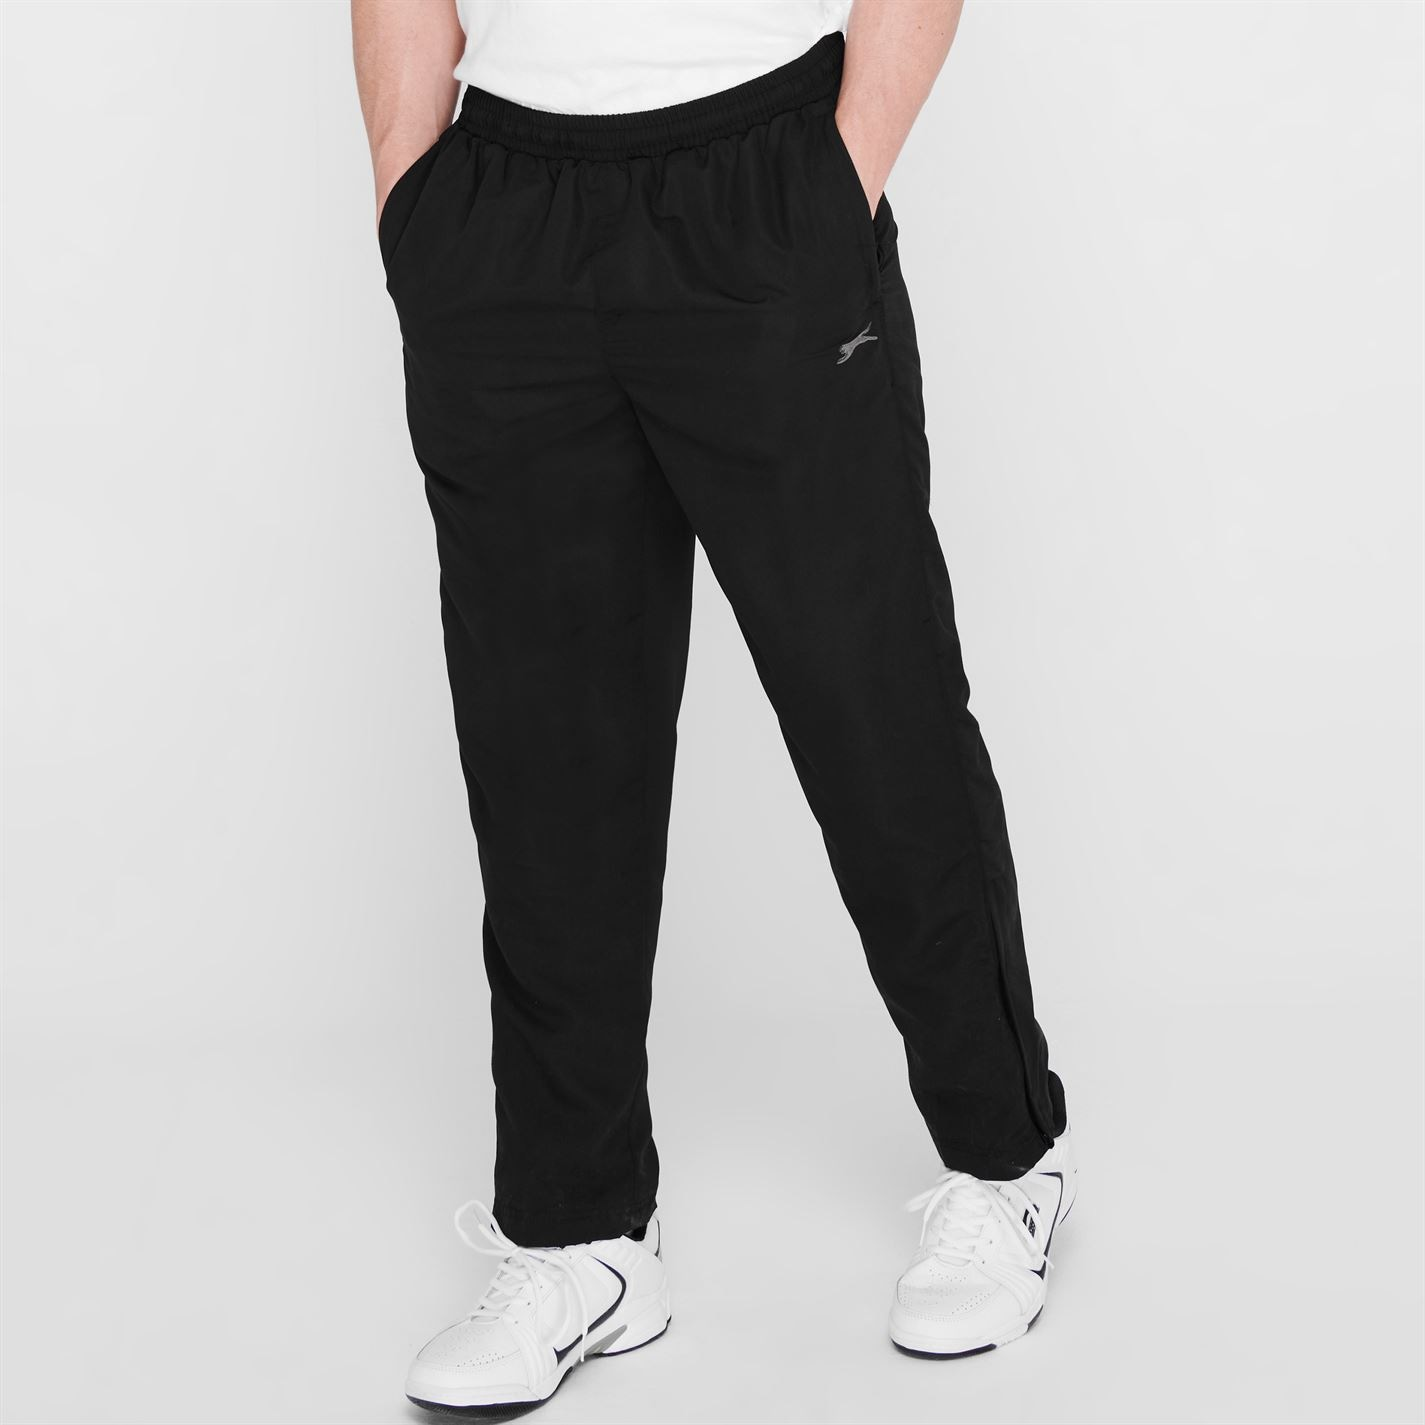 Pantaloni sport Slazenger fara mansete Woven pentru Barbati negru